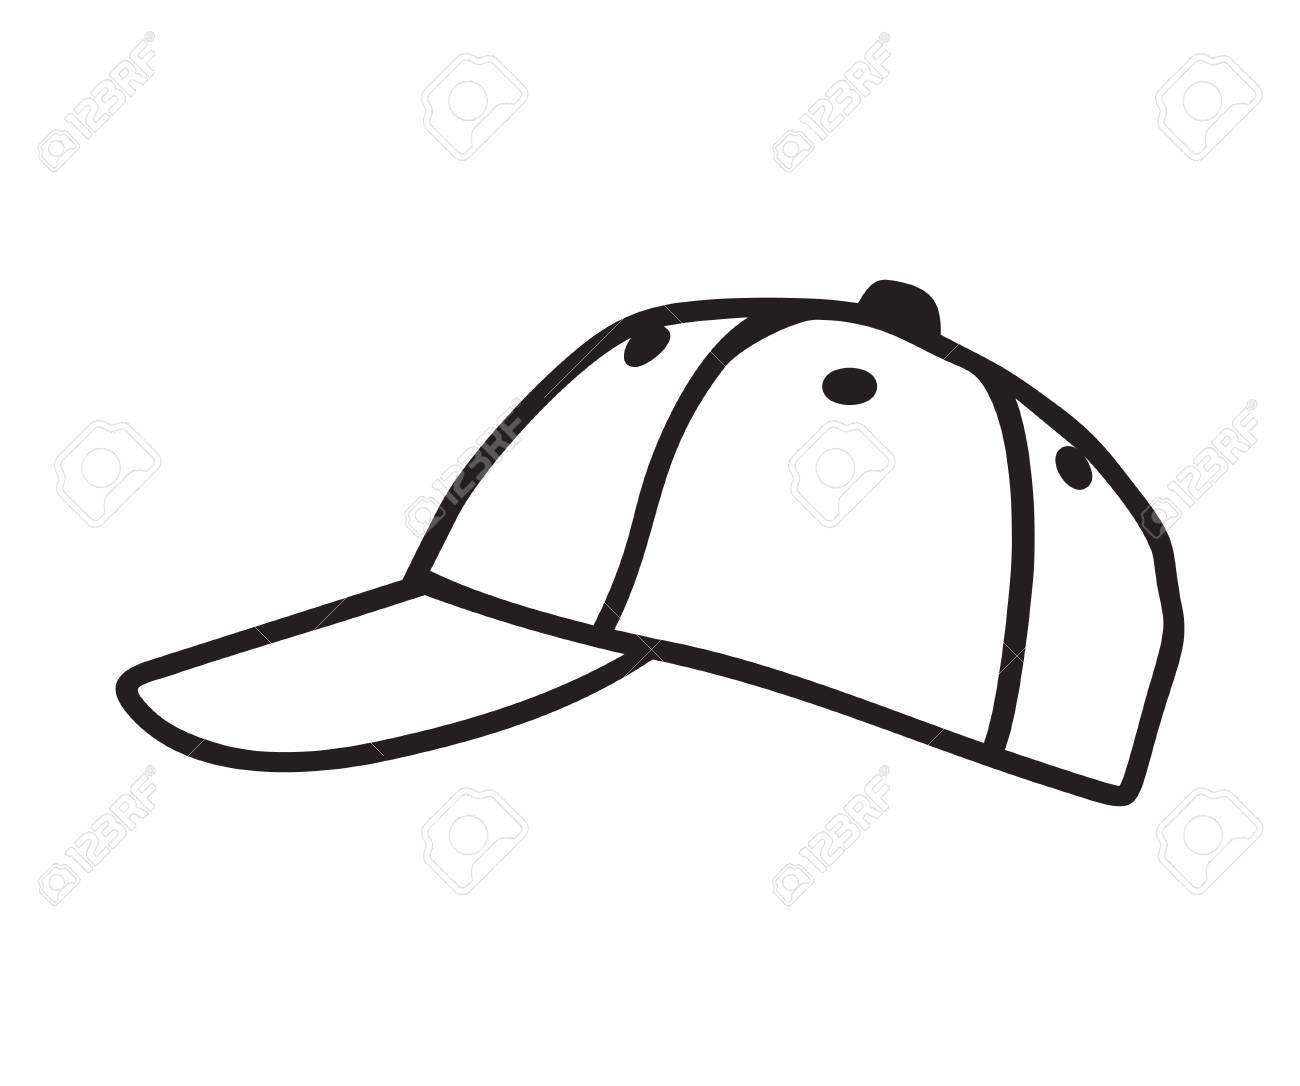 baseball cap vector royalty free cliparts vectors and stock rh 123rf com baseball hat vector image baseball hat vector template